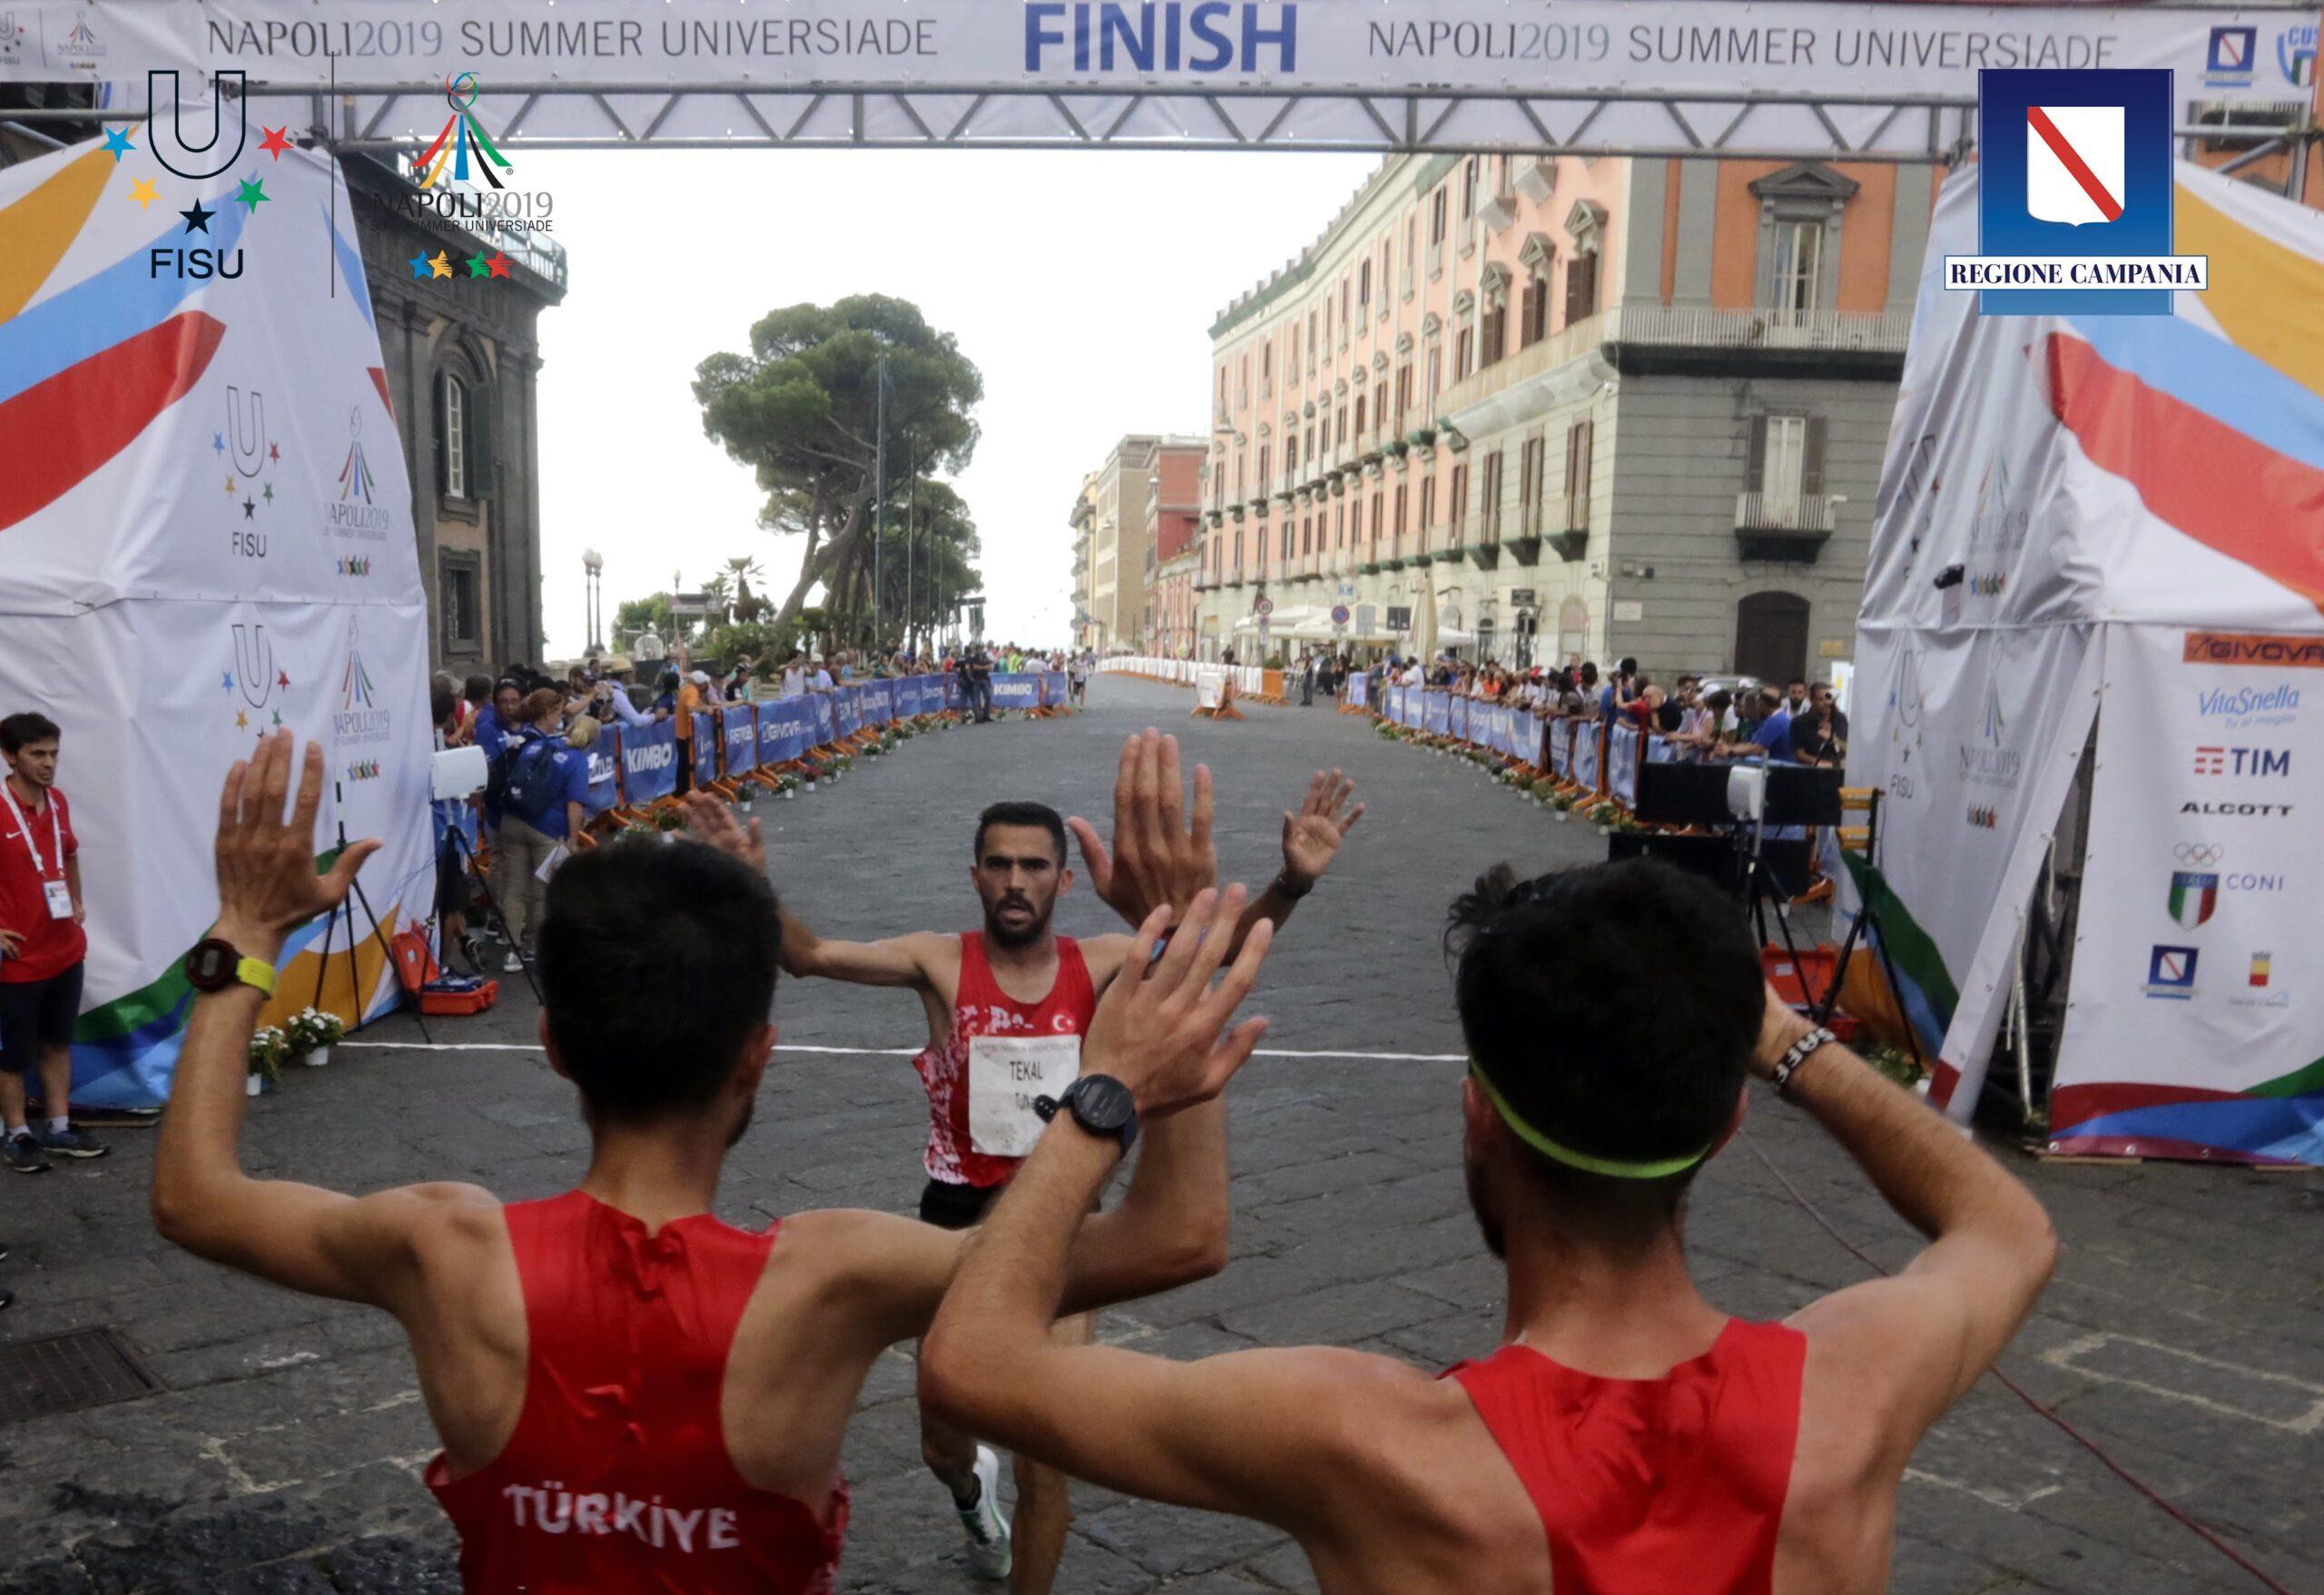 Napoli 13 luglio 2019 Universiade 2019 : MEZZA MARATONA  Ph: Photopool Universiade